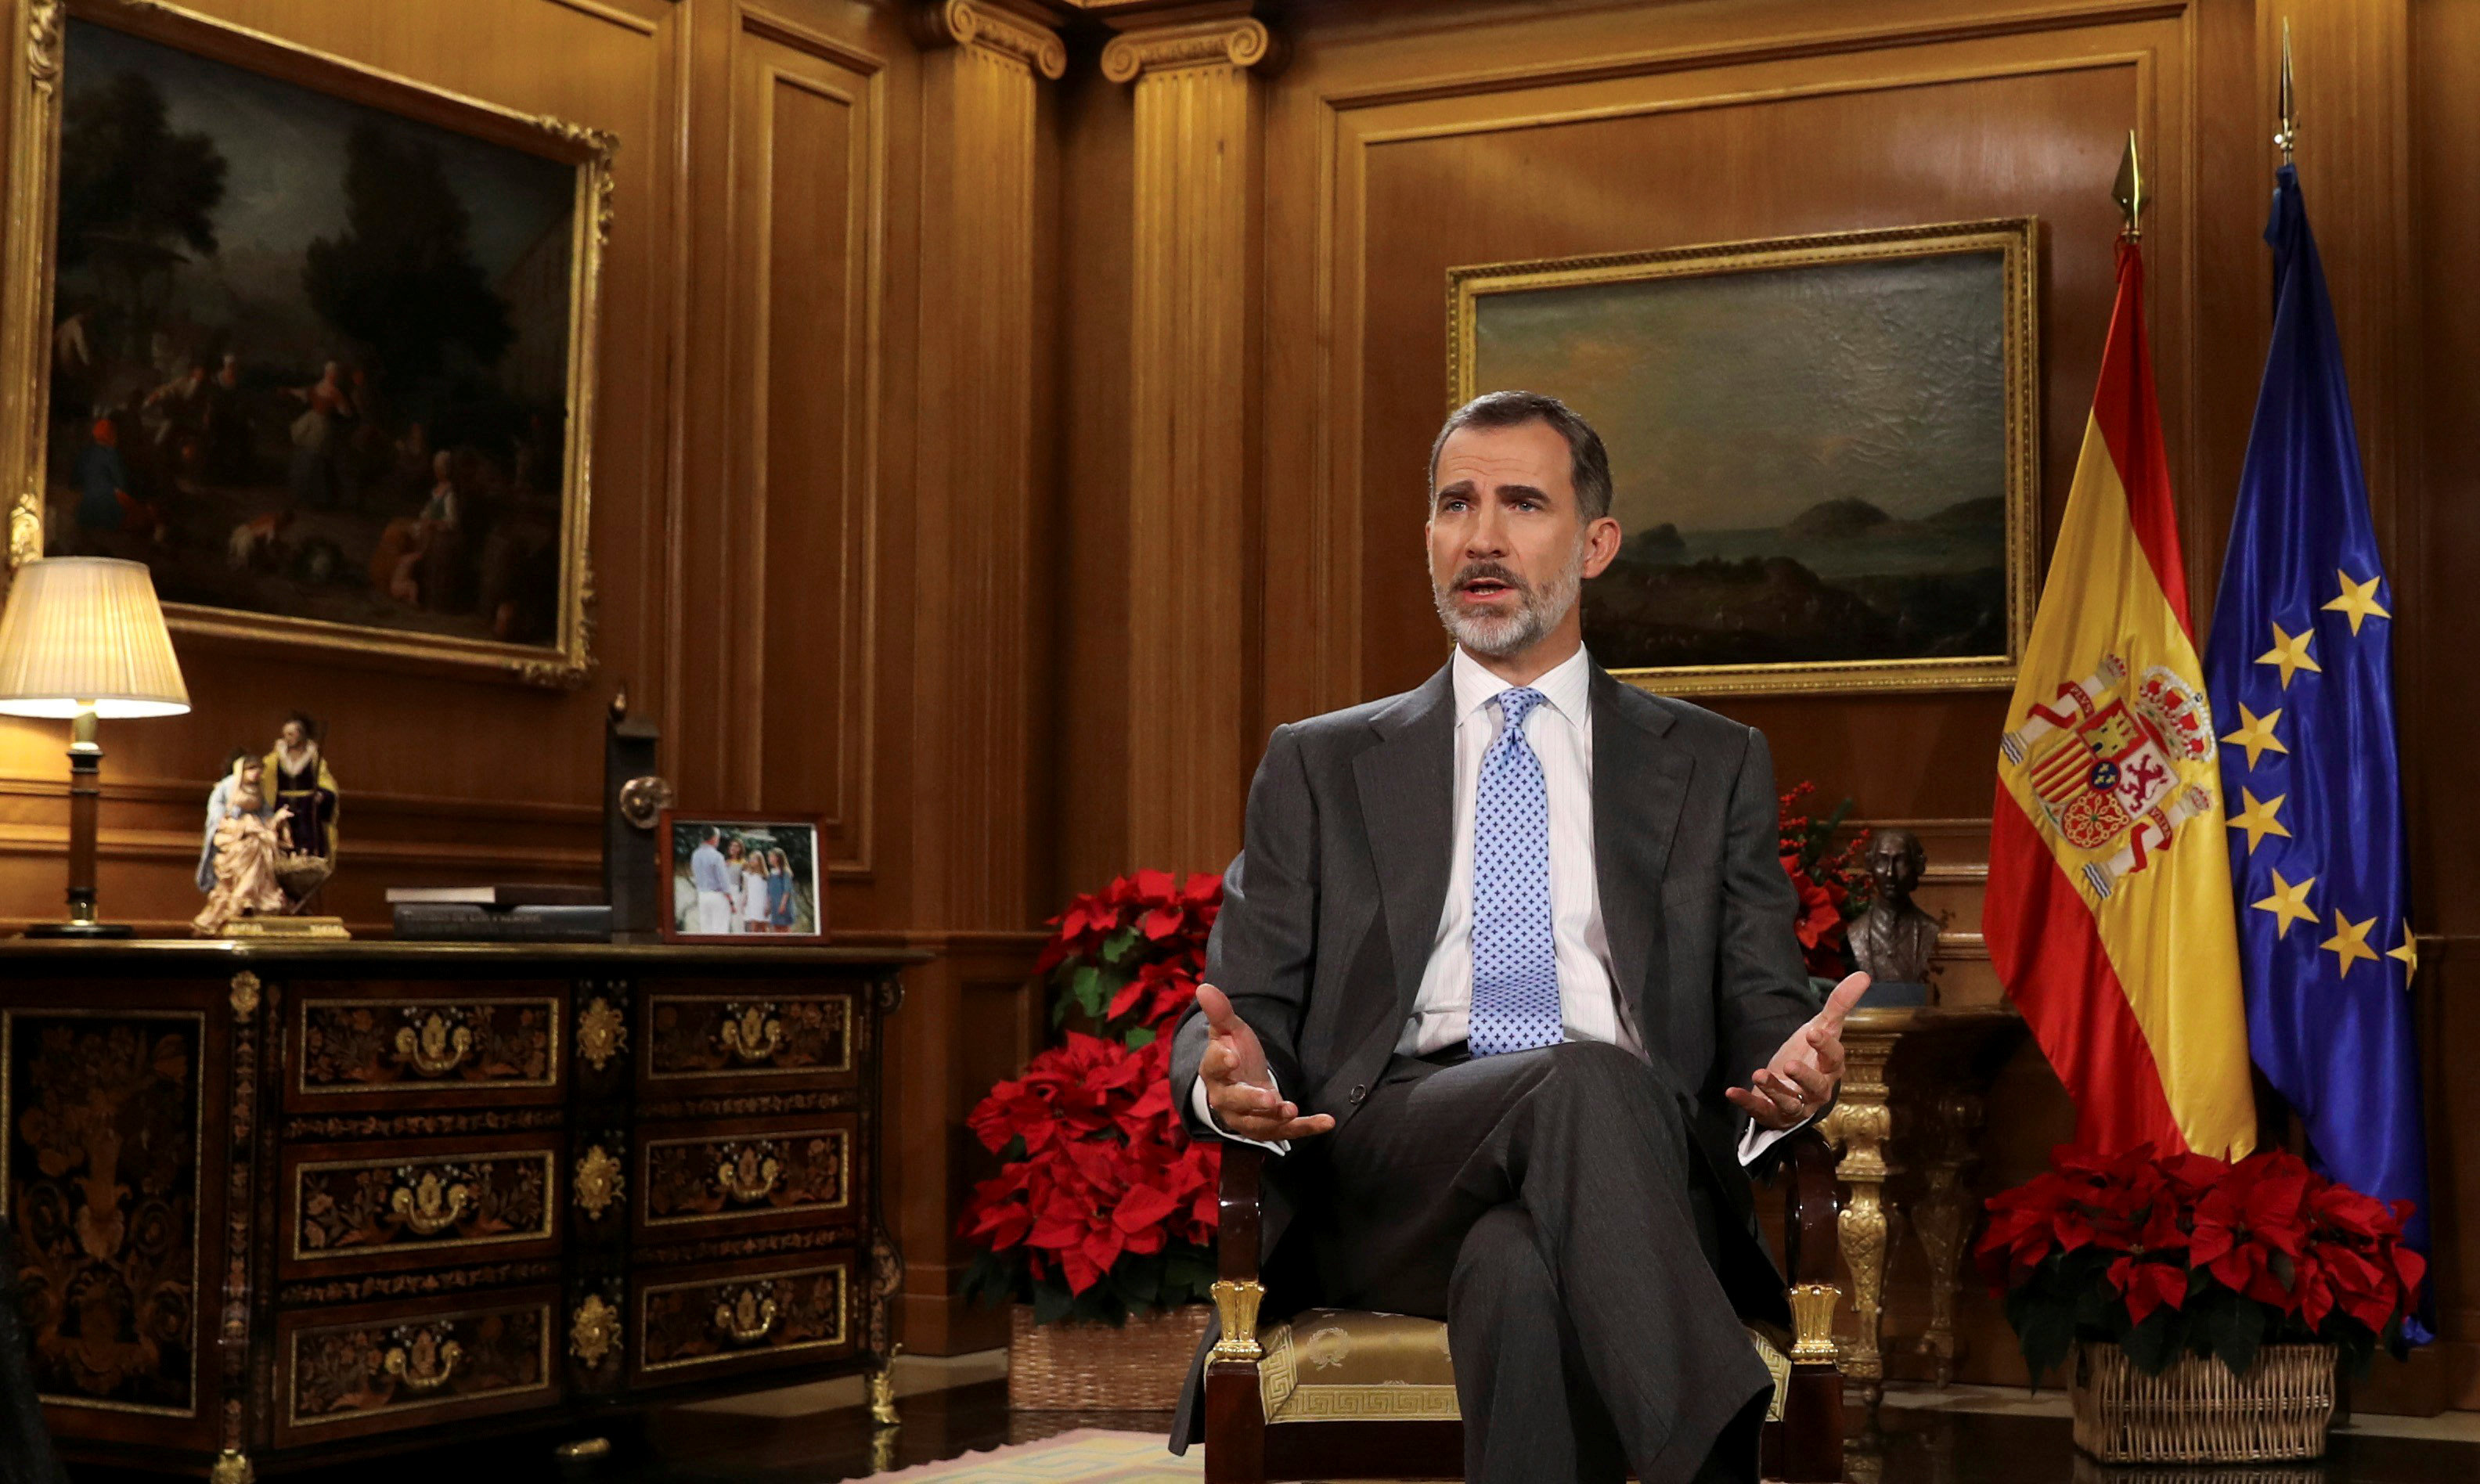 Facing royal mess, Spain's king seeks to steady crown